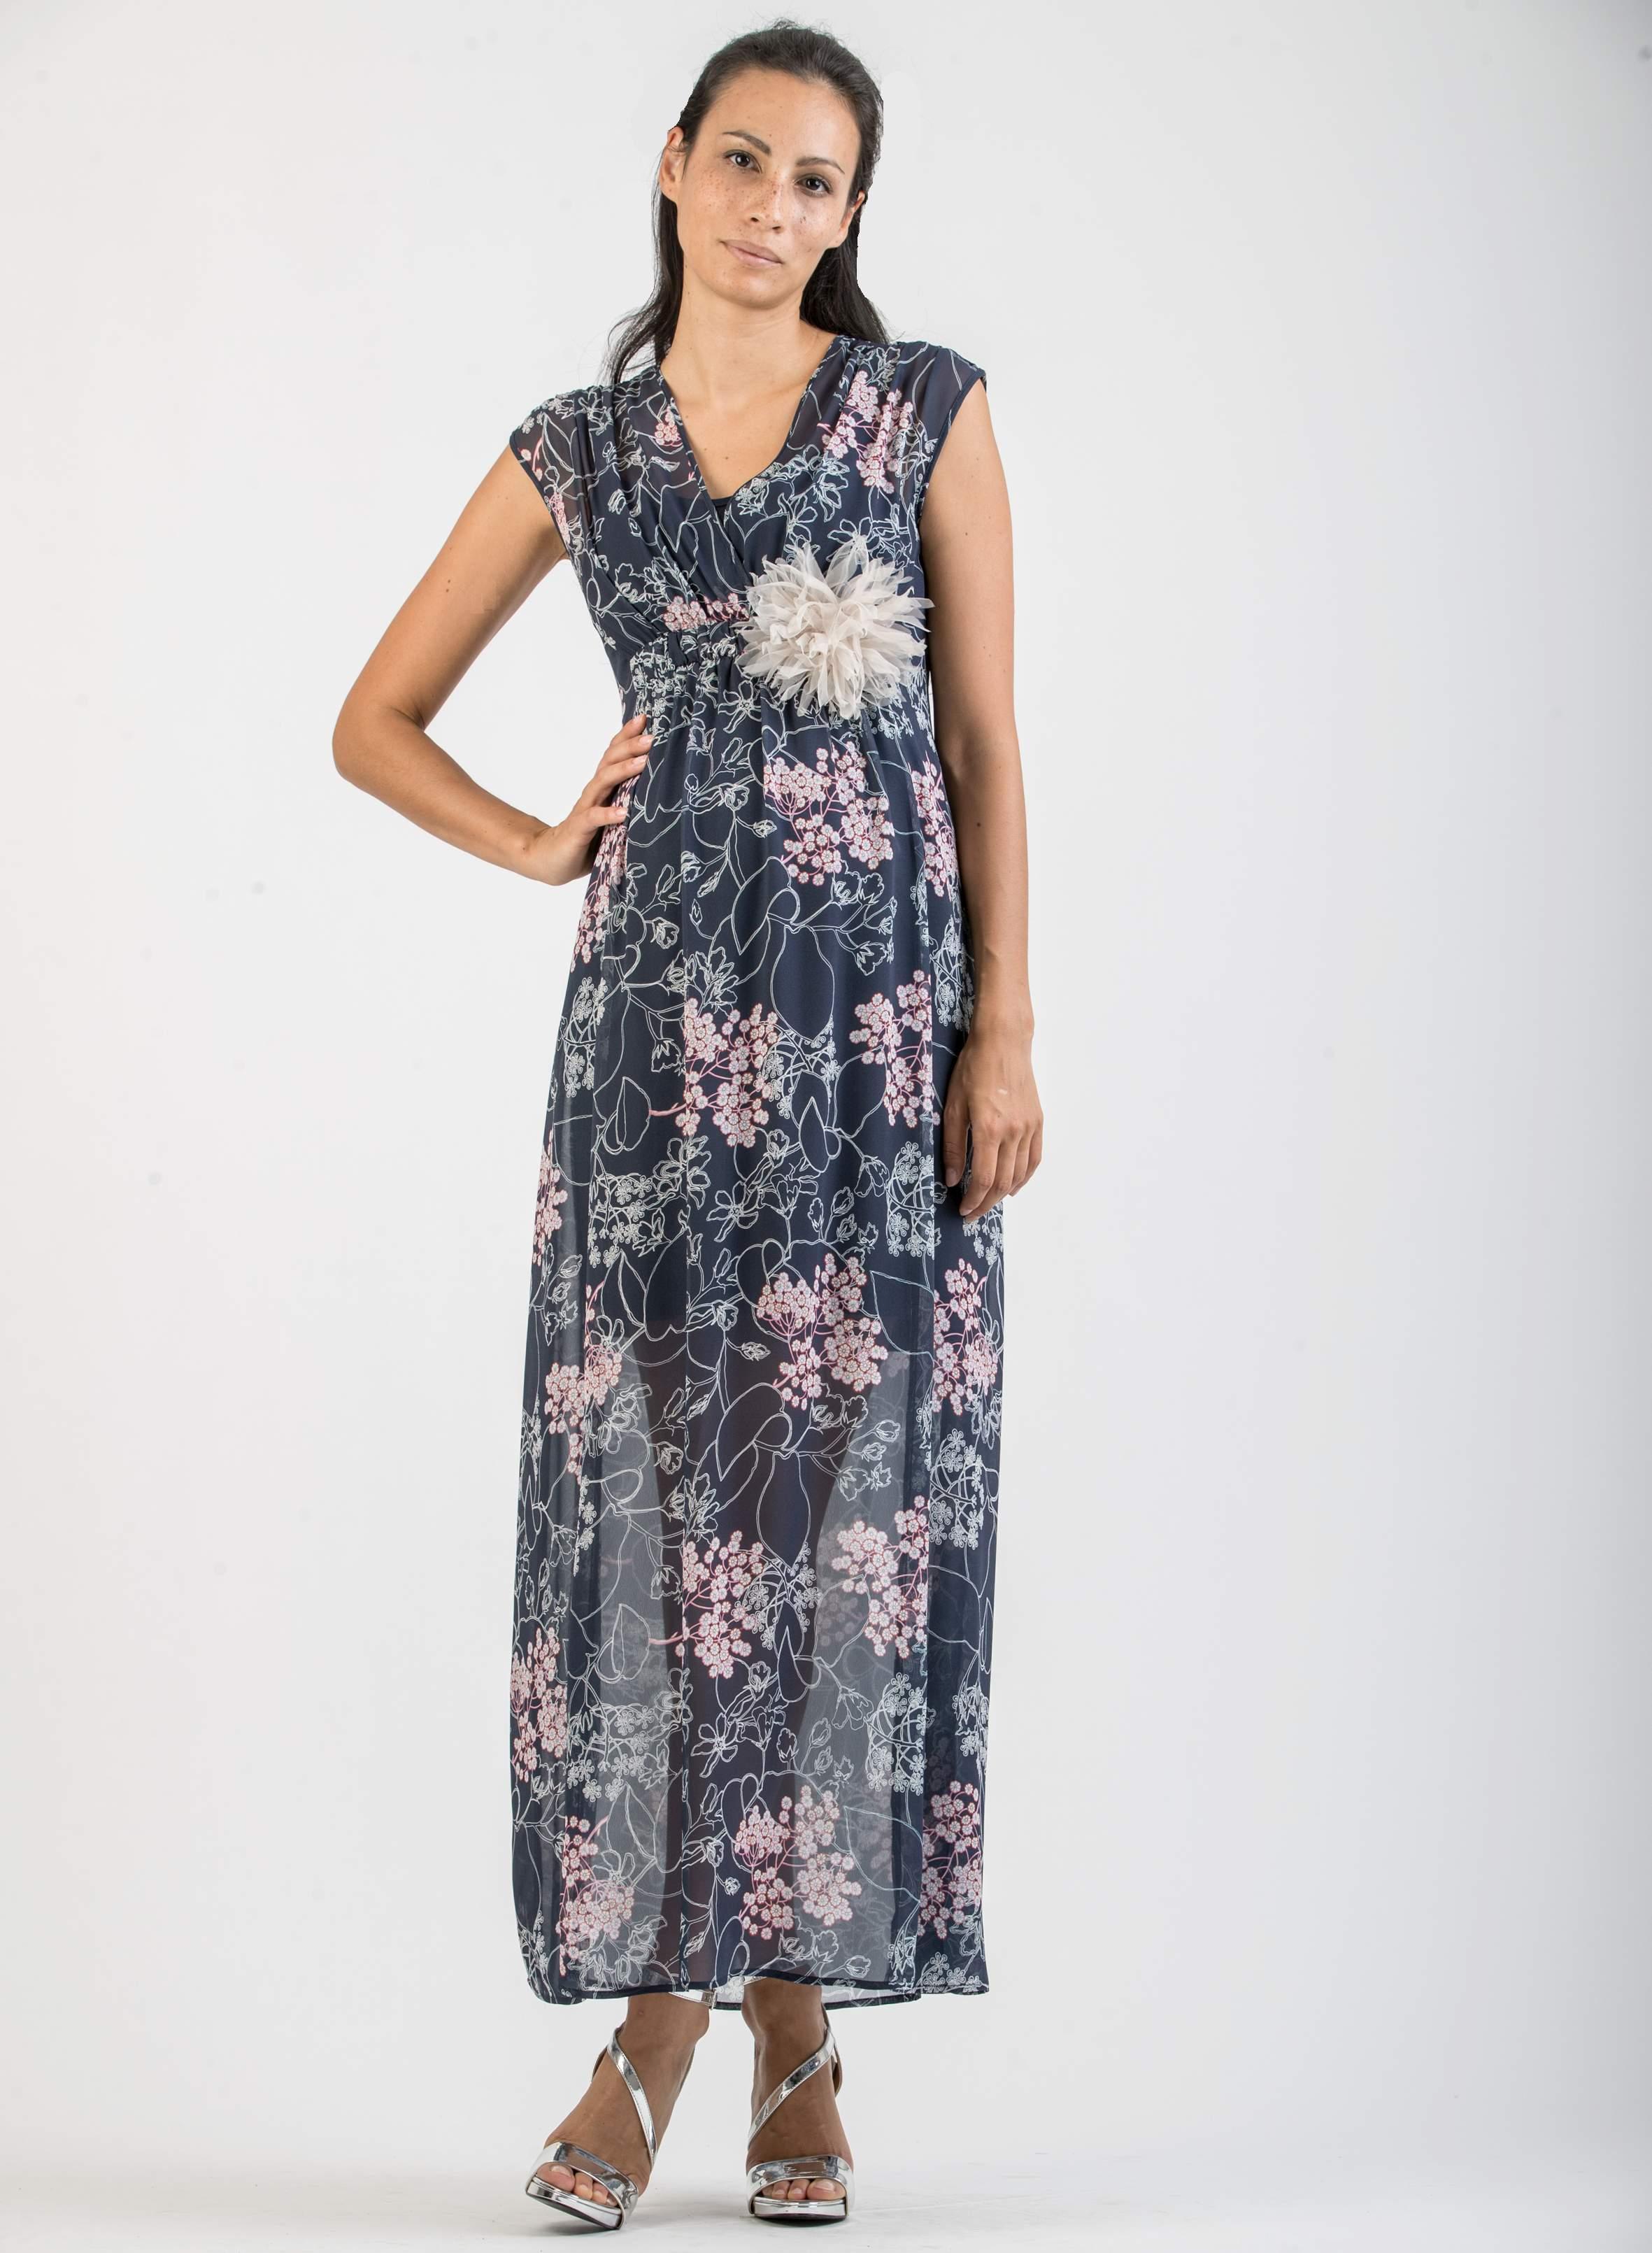 6a74d7a4d67b4 Dresses - Floral Print Maternity & Nursing Dress   Attesa Maternity